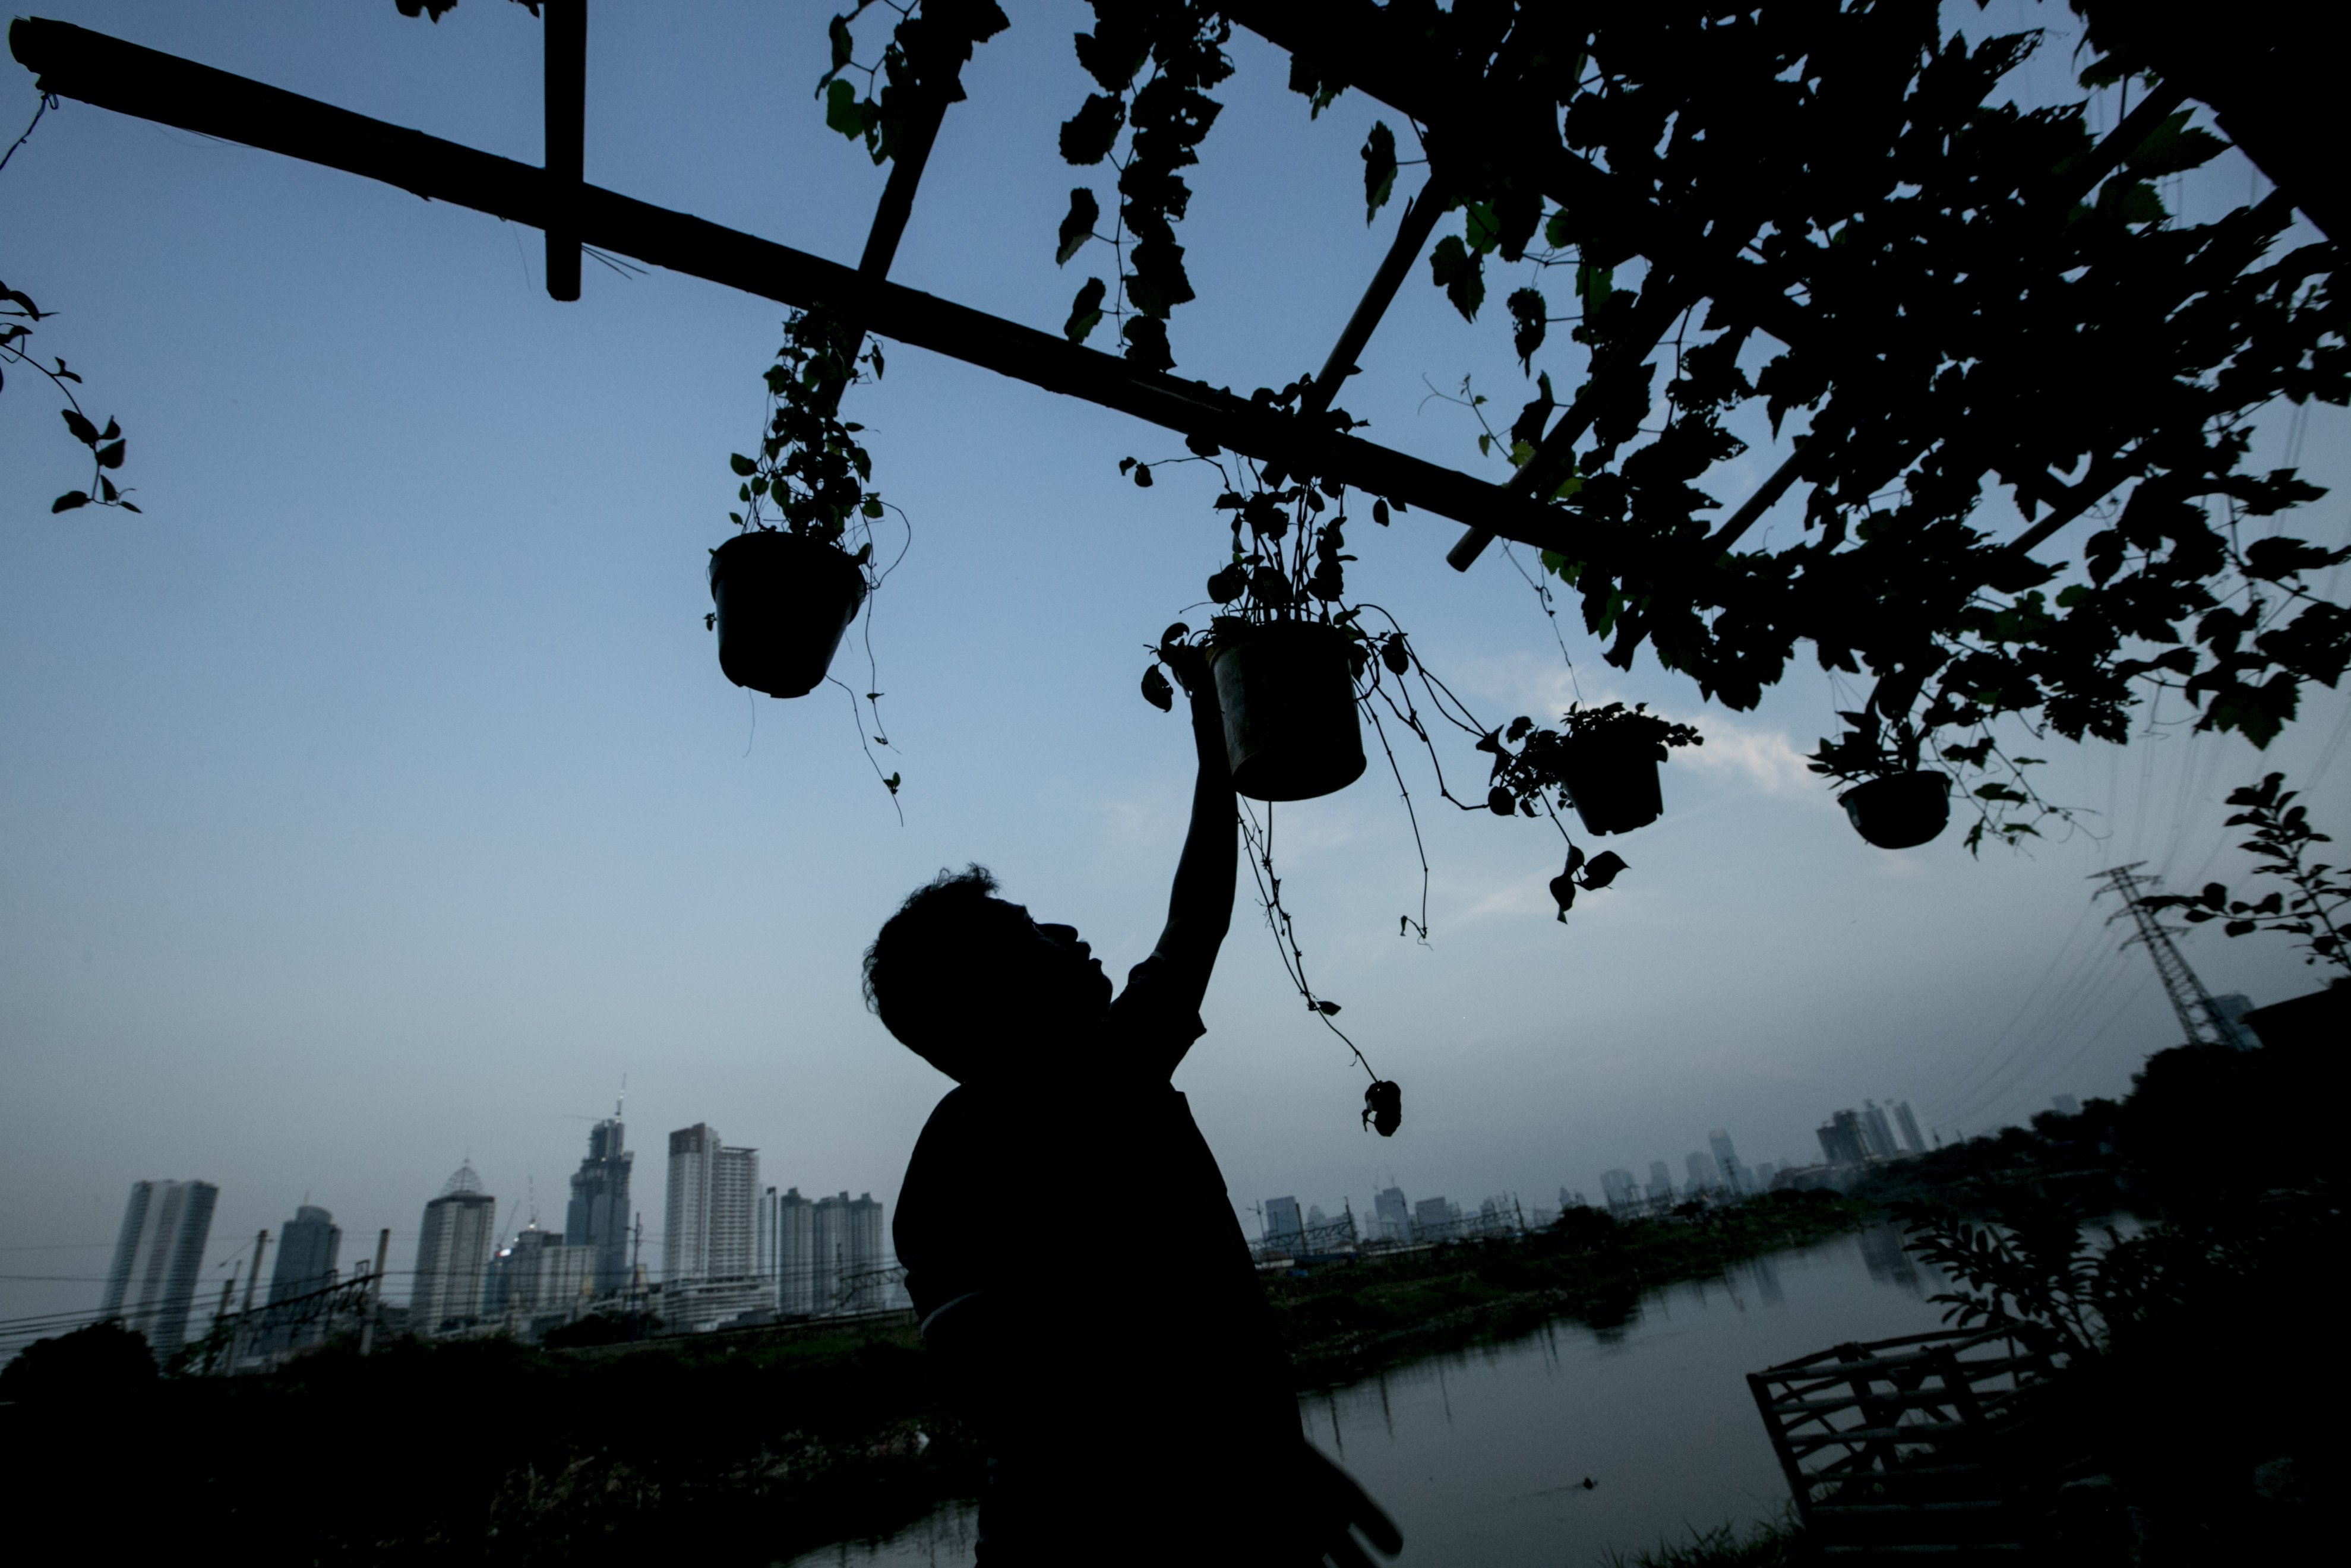 Ondi (44) menyiram tanaman di bantaran Sungai Ciliwung, Petamburan, Jakarta Pusat, Minggu (12/7/2020). Selama enam tahun ia memanfaatkan lahan bantaran kali Ciliwung untuk bertani bersama kelompok Mandiri Indah Tani sebagai upaya memenuhi kebutuhan hidup diatas keterbatasan lahan dan kemampuan.